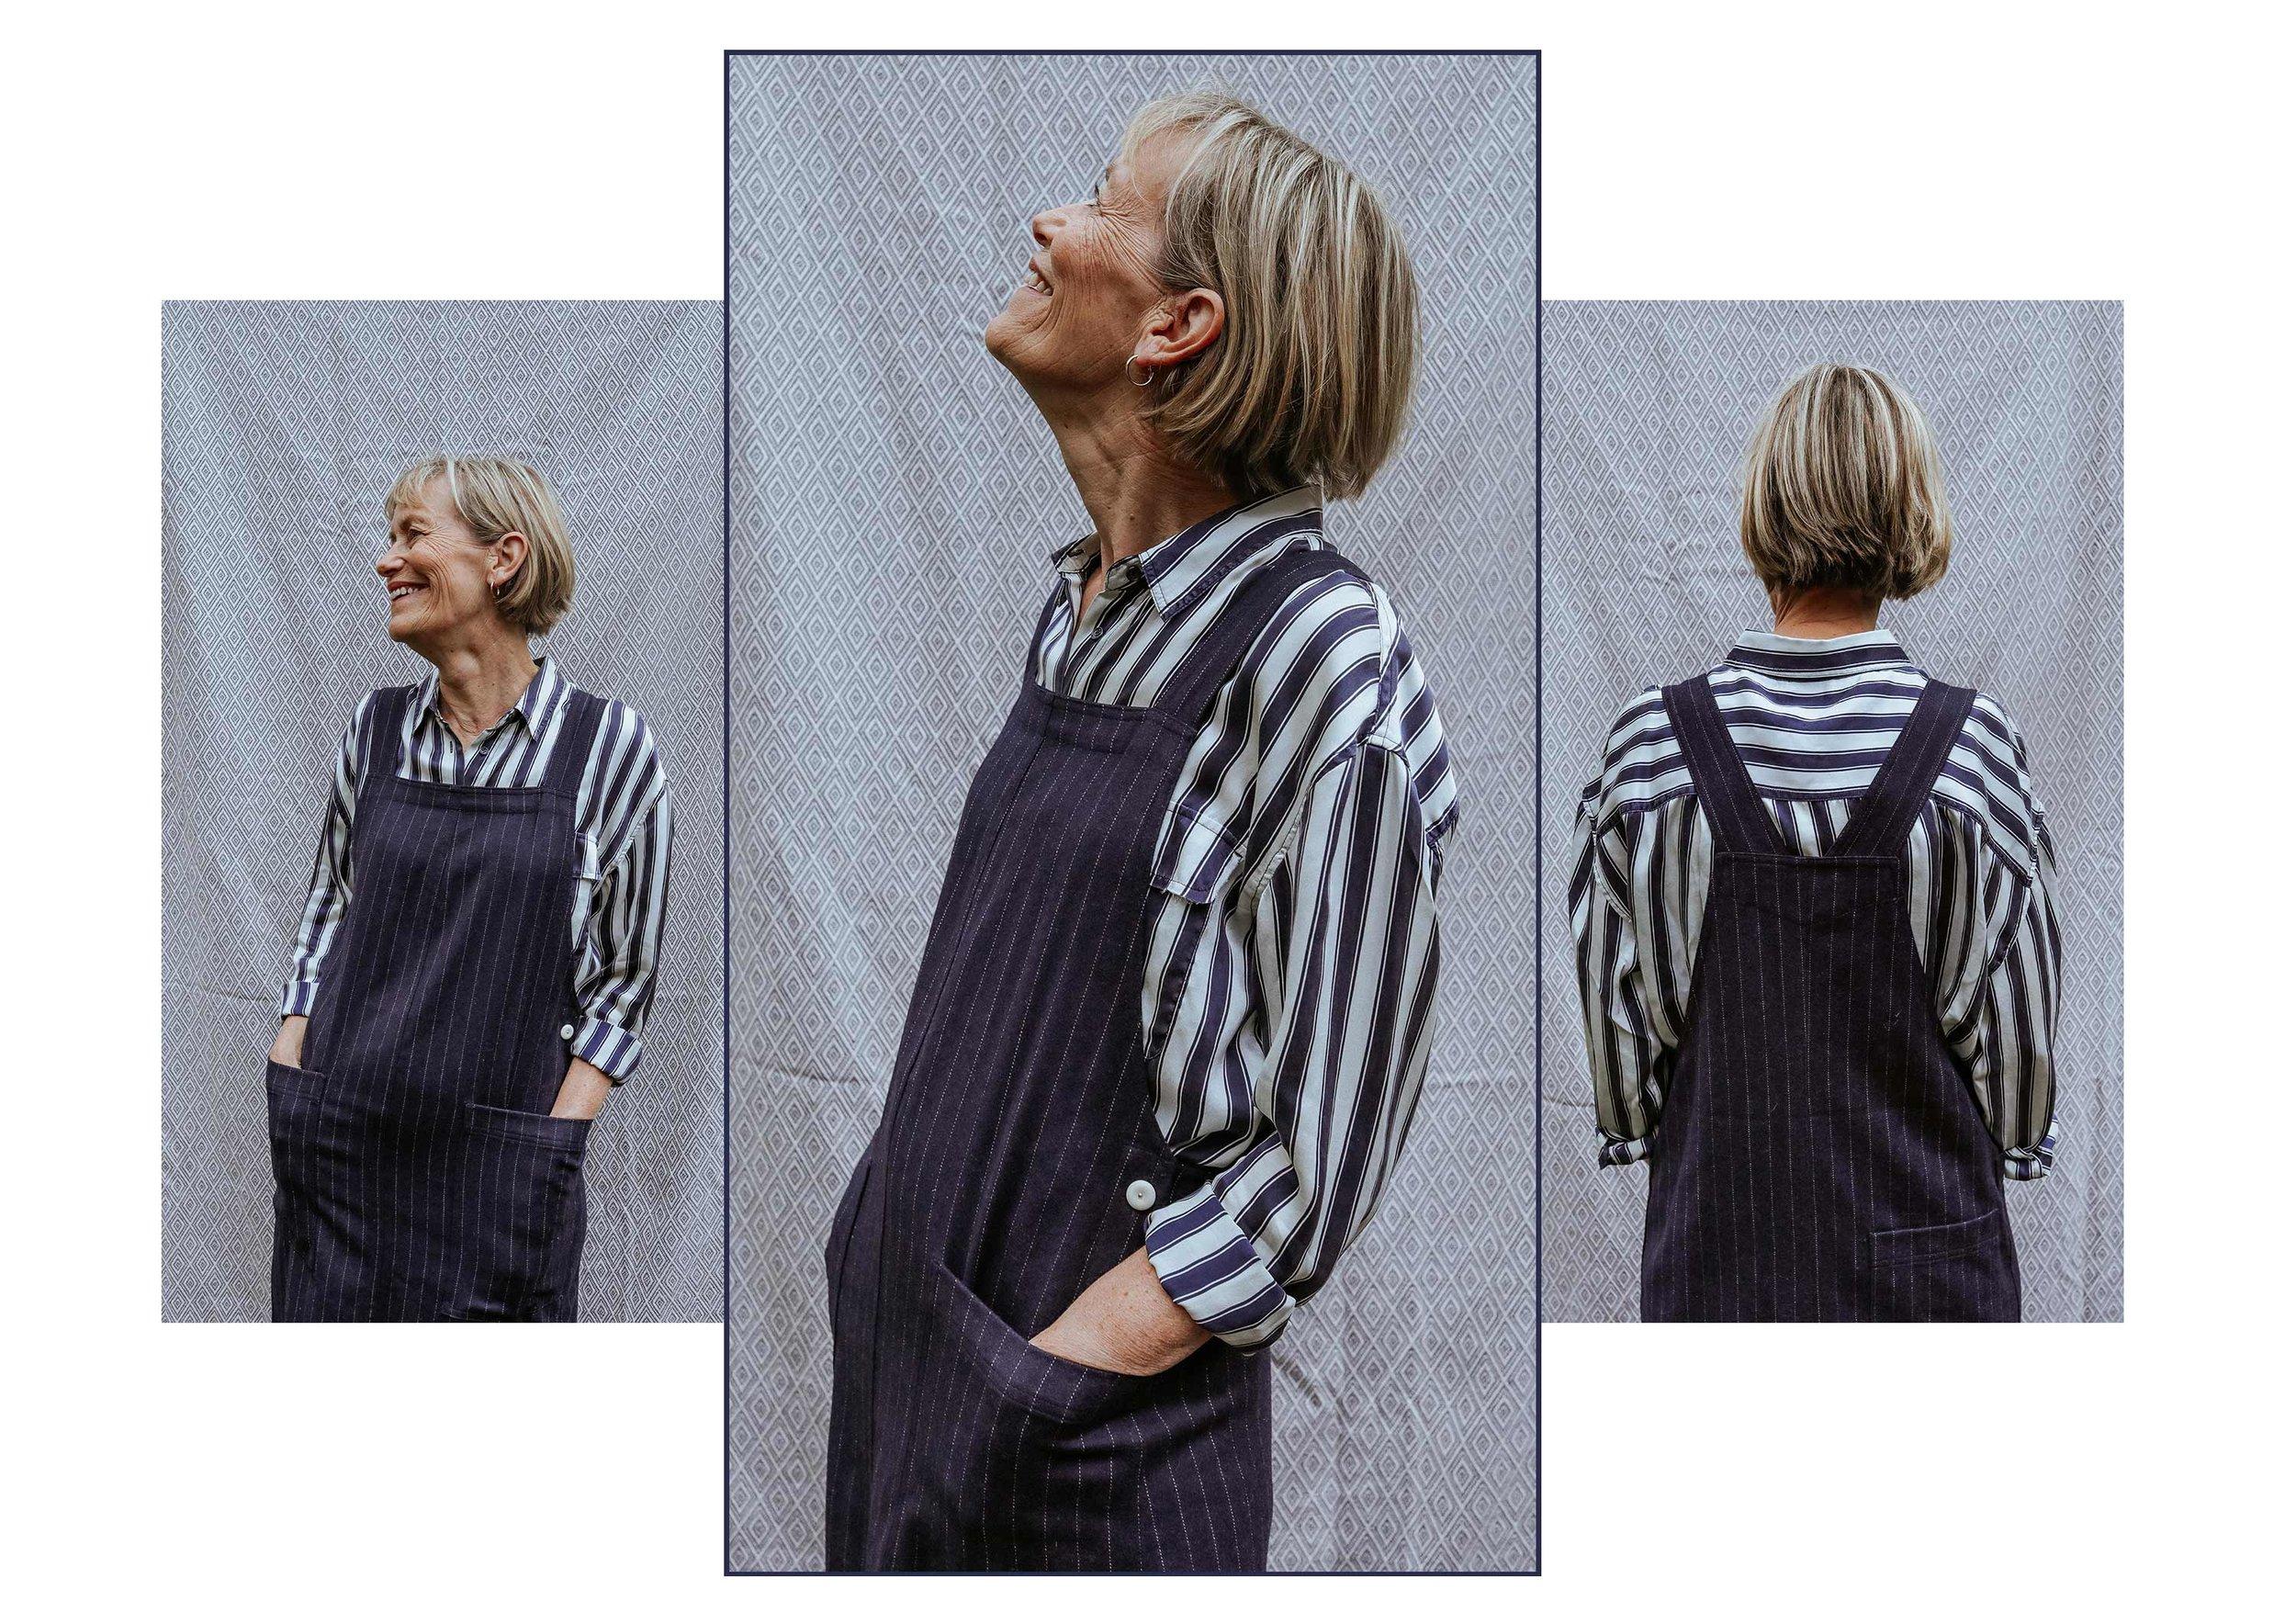 Stripey-shirt-31.jpg